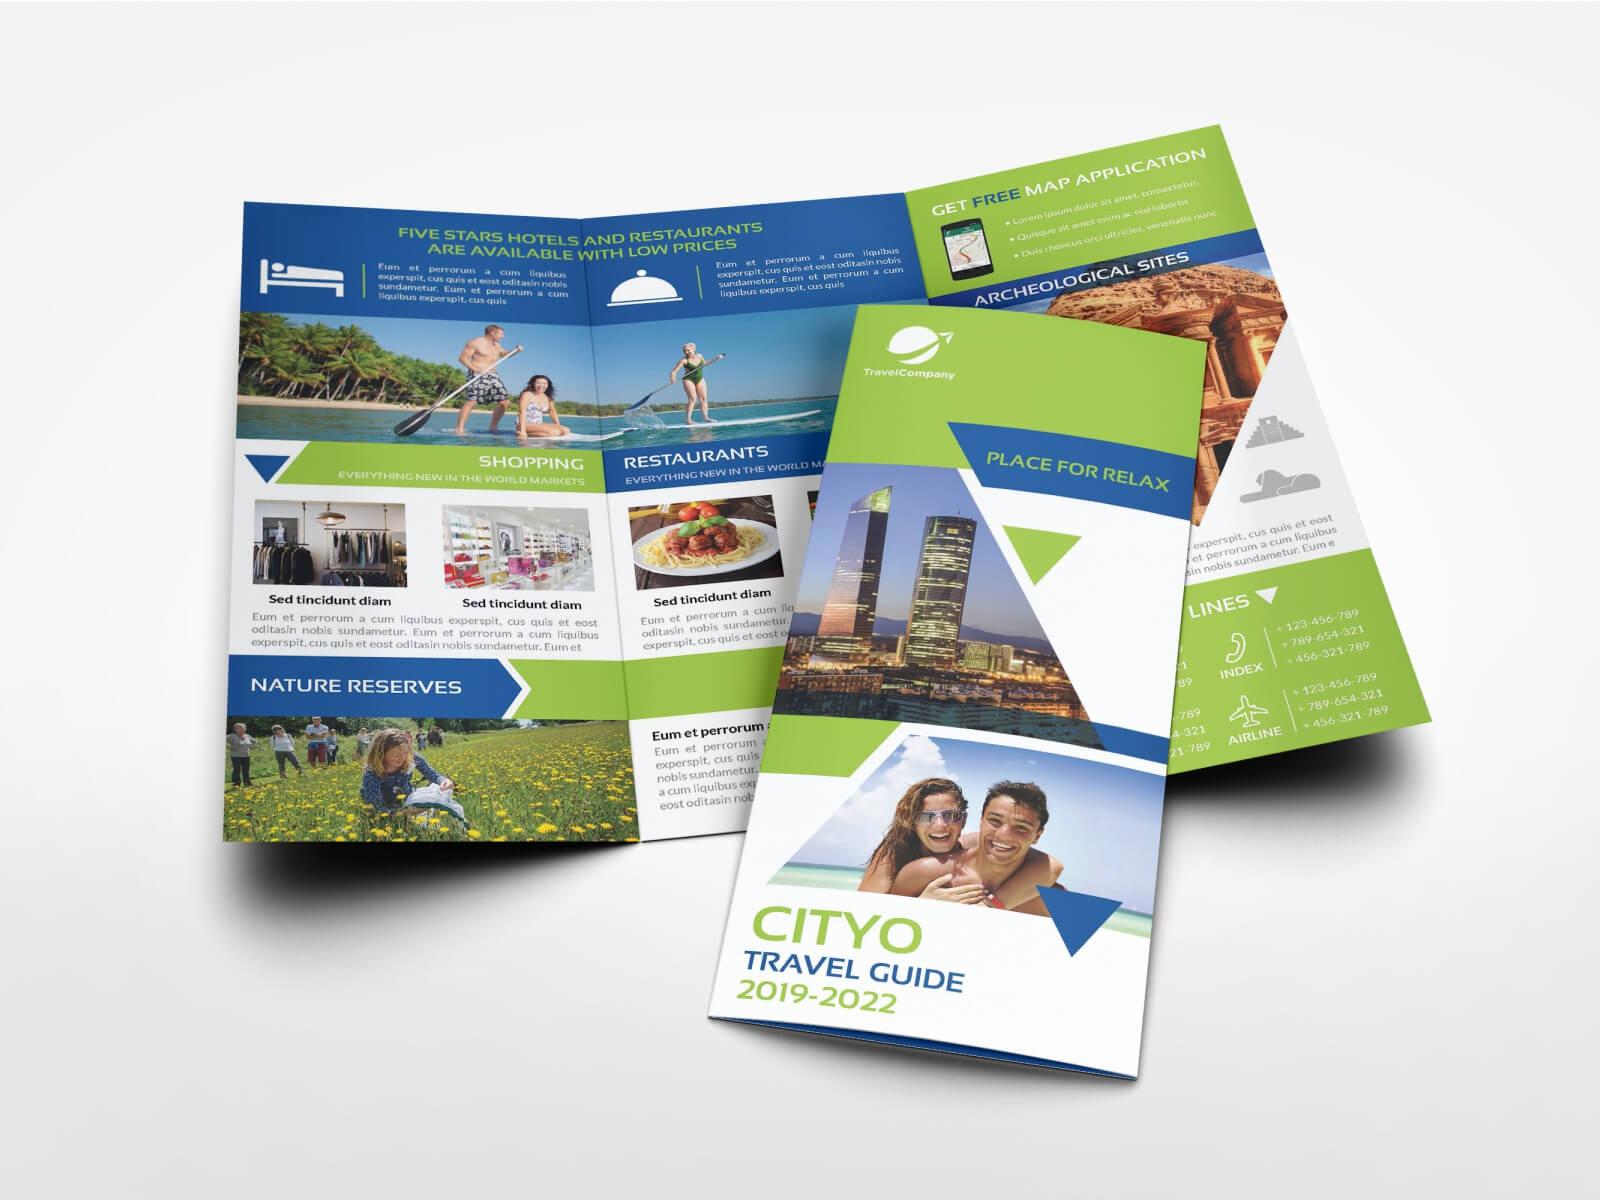 Travel Guide Tri Fold Brochure Templateowpictures On For Travel Guide Brochure Template